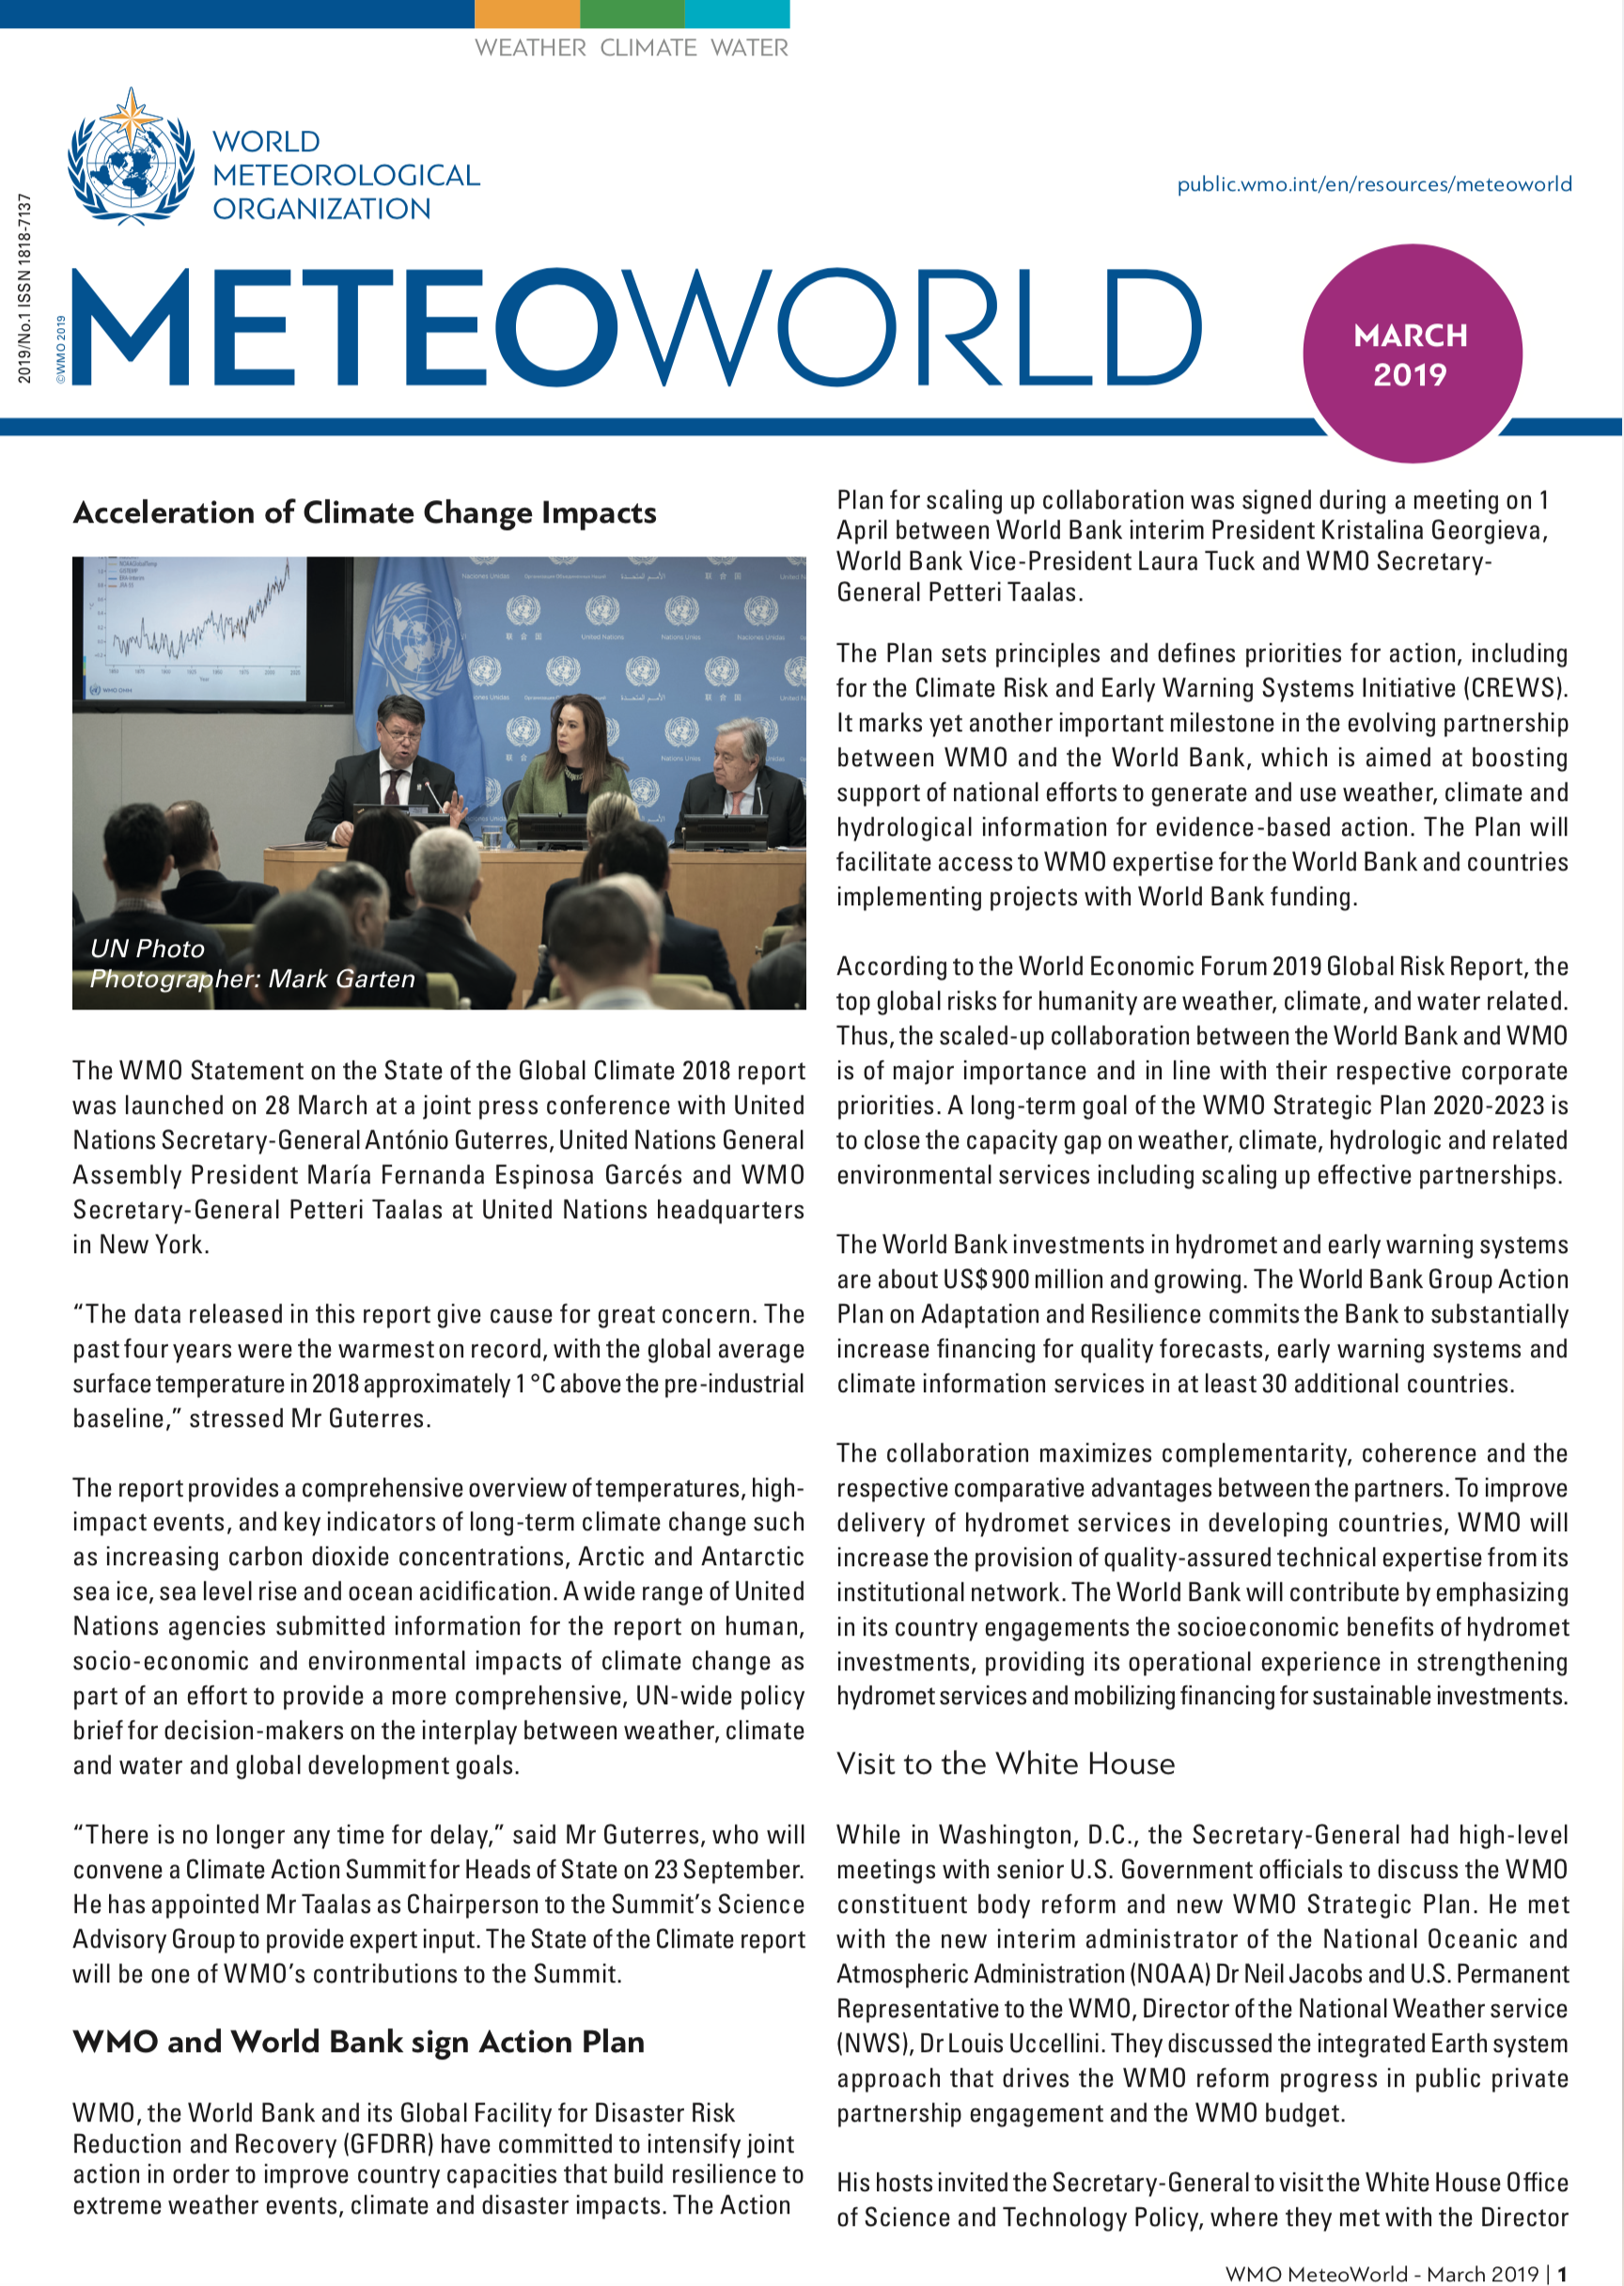 MeteoWorld No. 1 March 2019